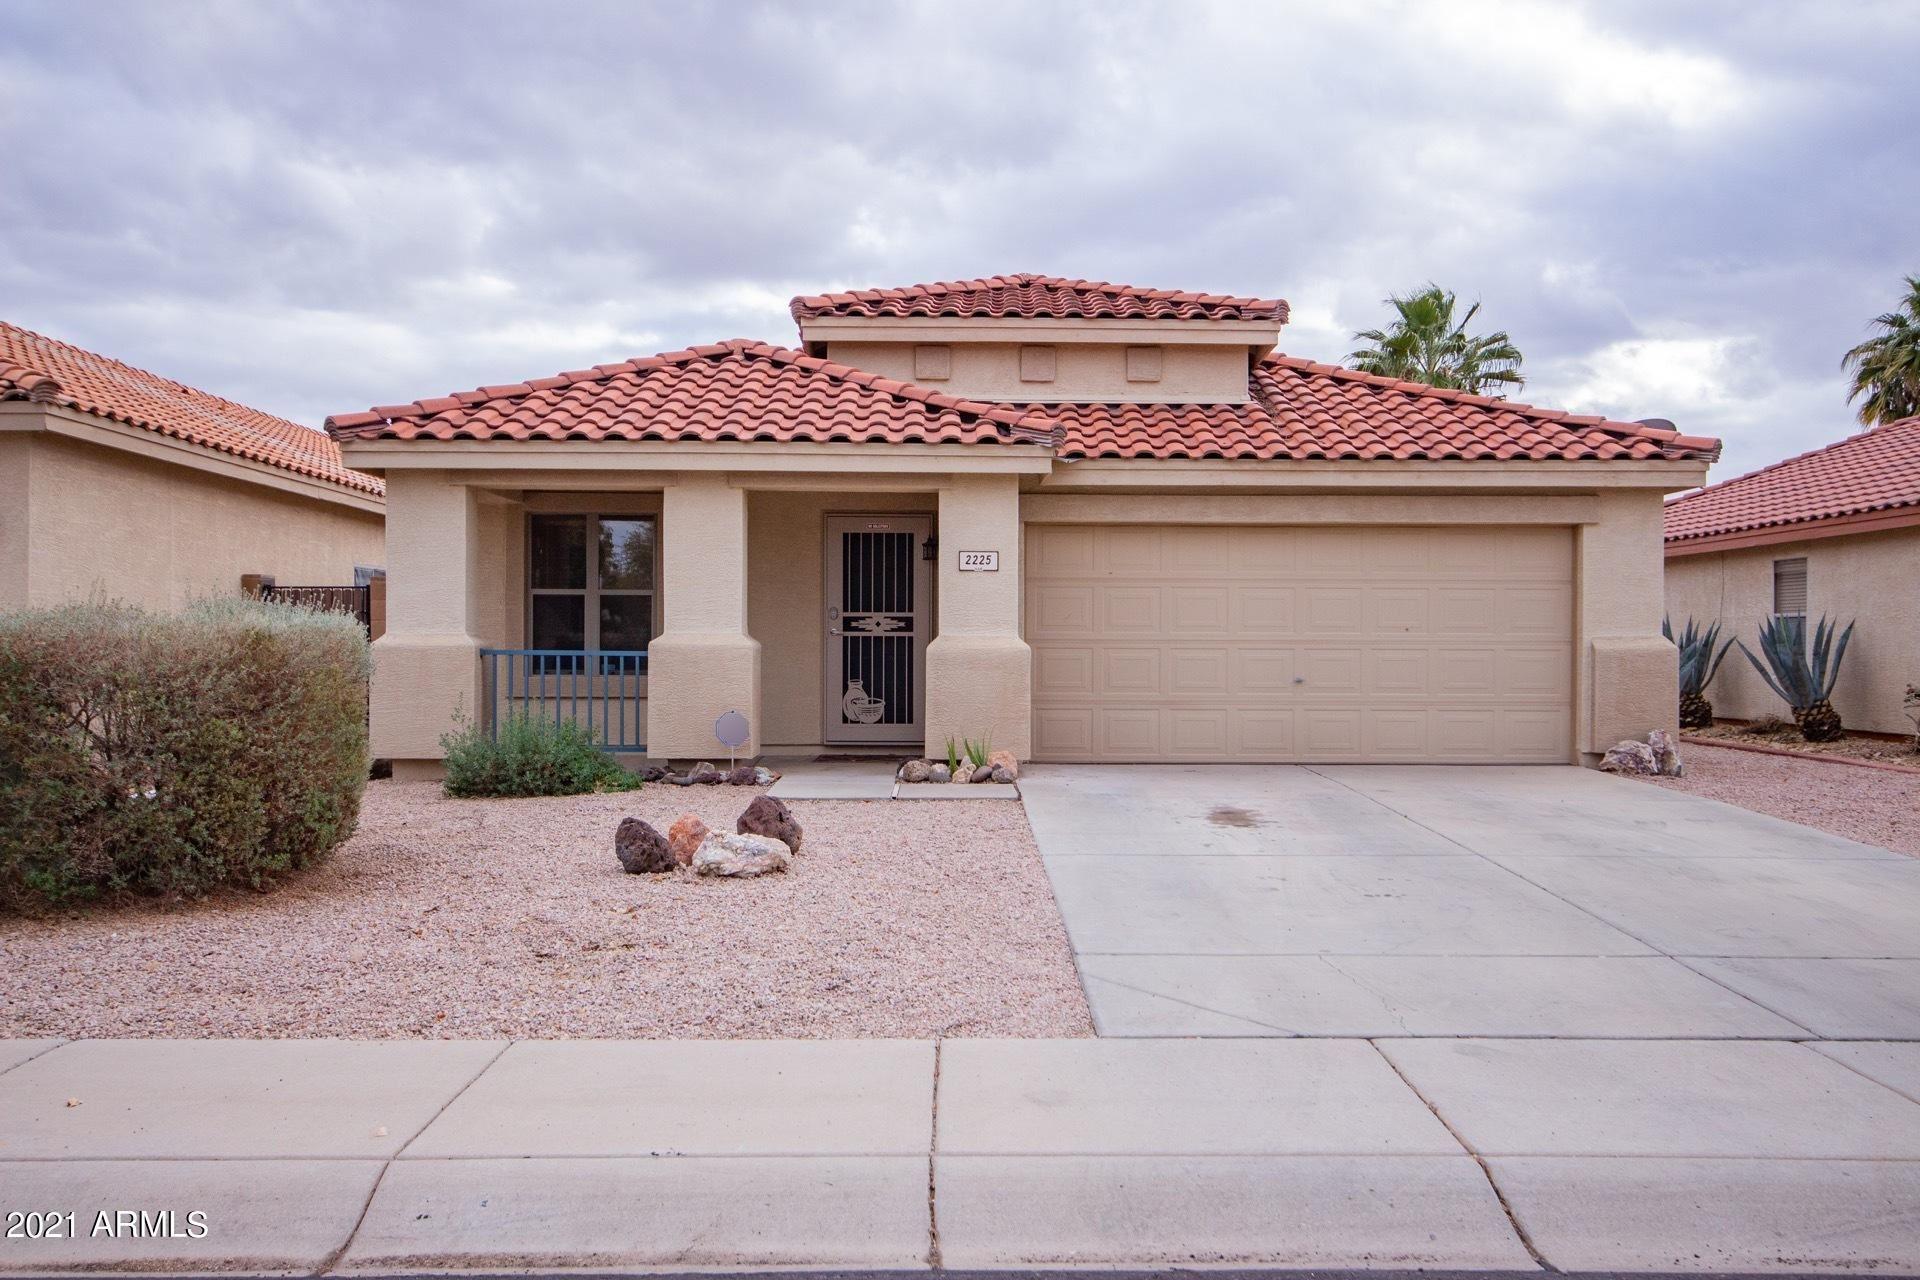 Photo of 2225 W 23RD Avenue, Apache Junction, AZ 85120 (MLS # 6198202)